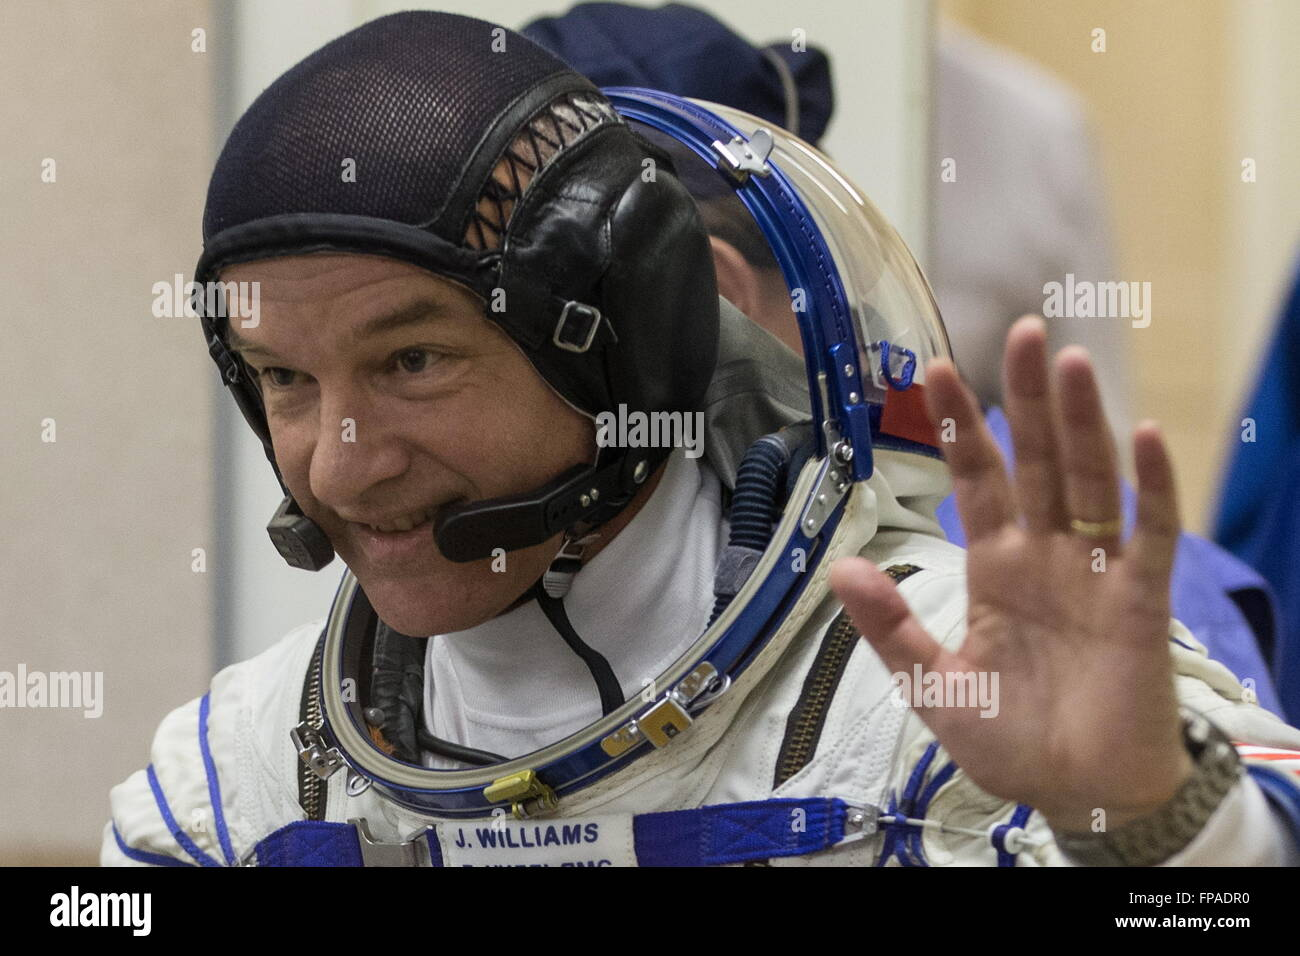 Baikonur, Kazakhstan. 18th Mar, 2016. Crew member of Expedition 47/48, NASA astronaut Jeffrey Jeff Williams waves - Stock Image